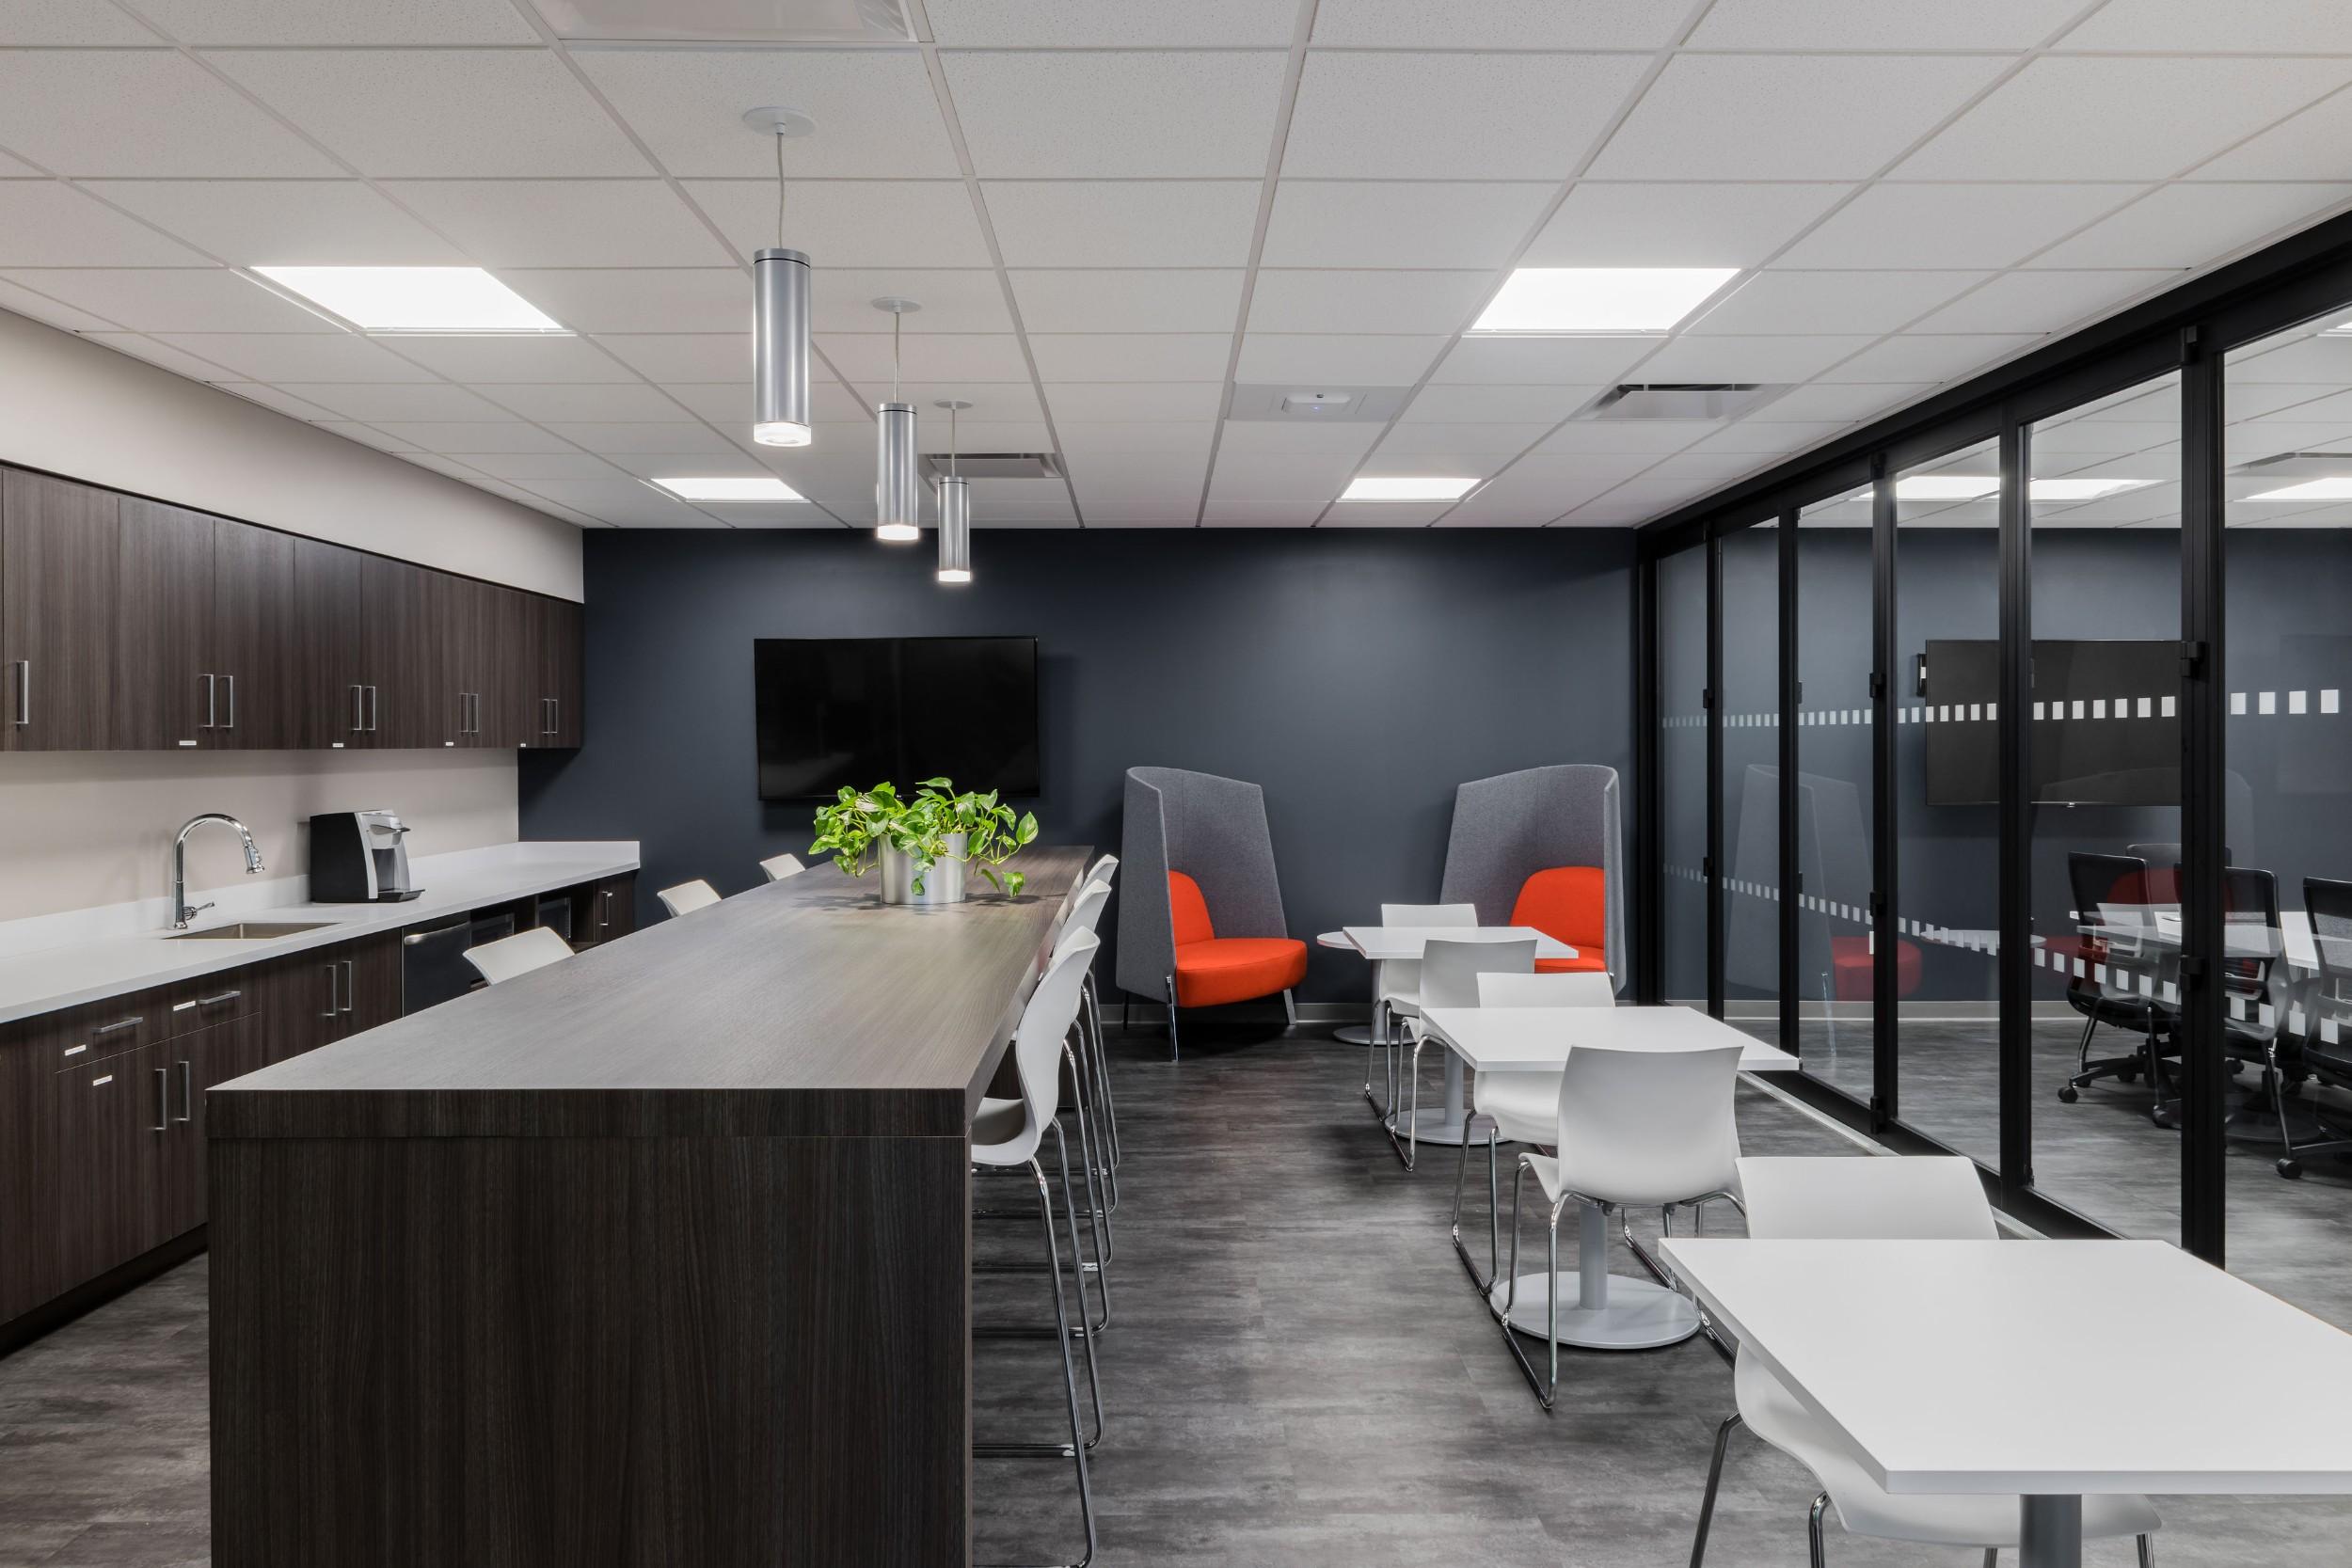 Berklee_Online_Corderman_Construction_Education_Office_Cafe_Conference_Room.jpg